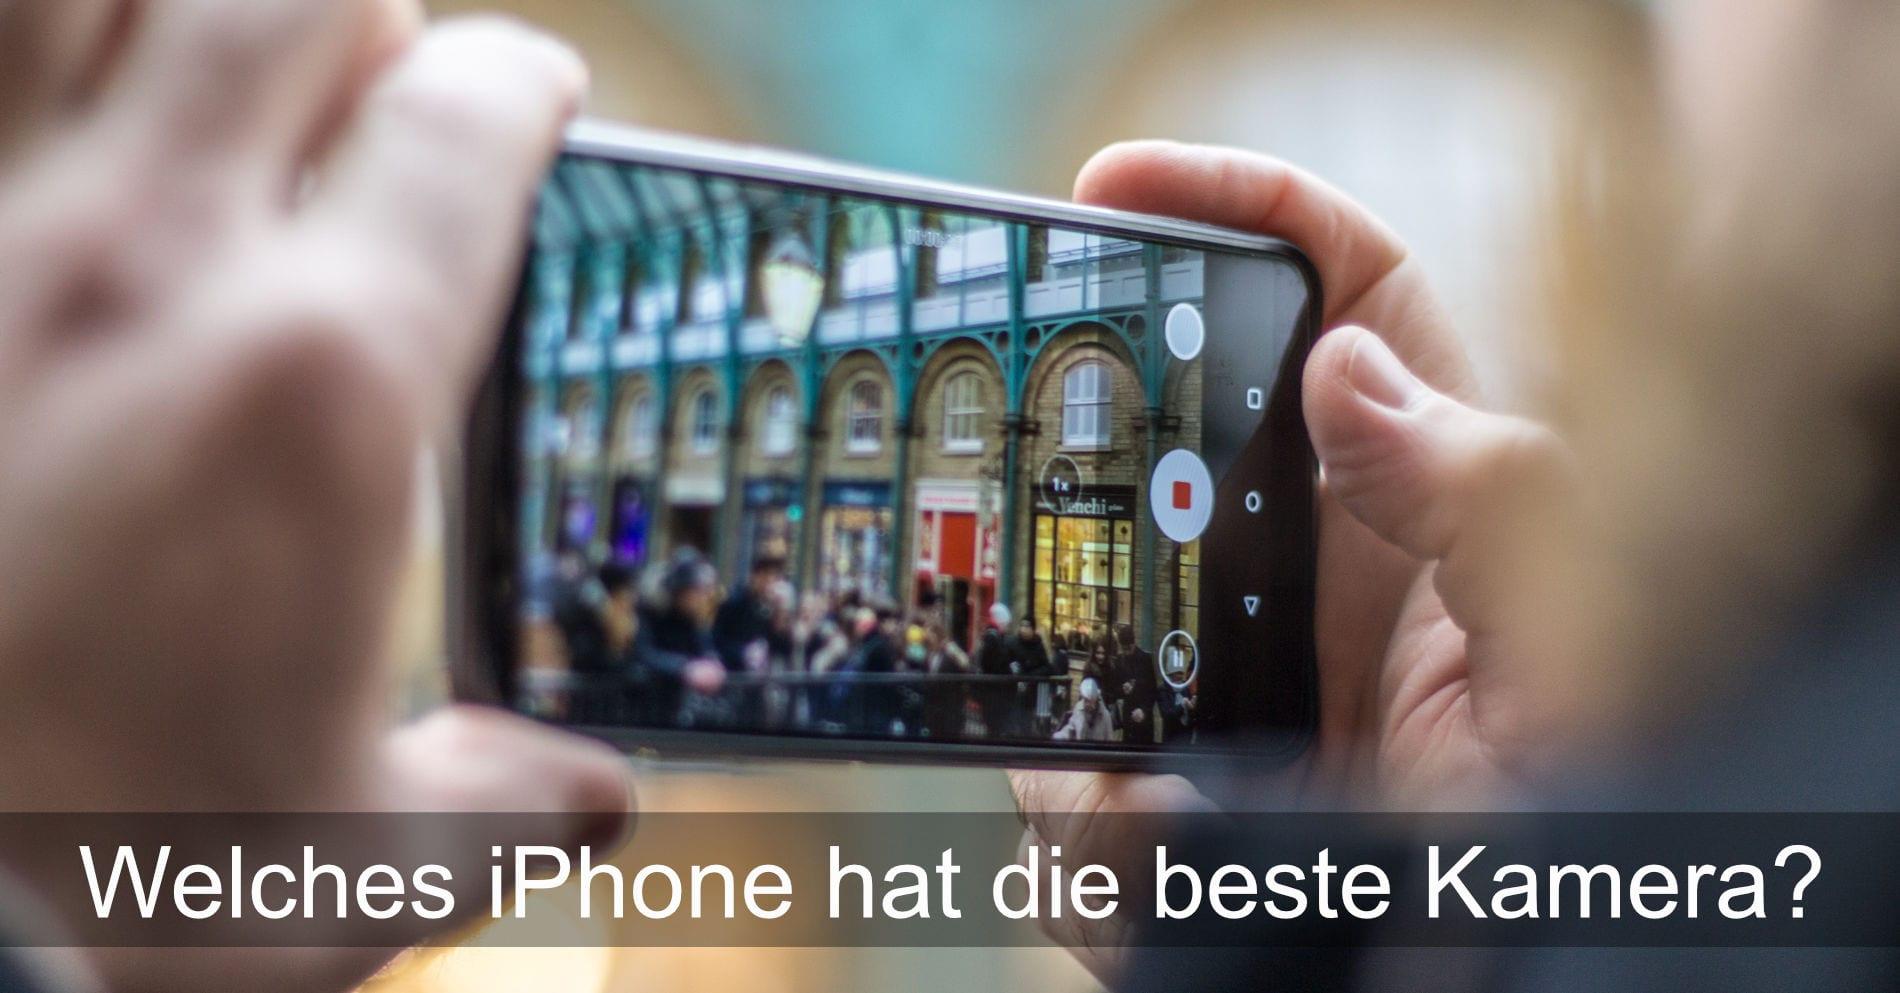 Welches iPhone hat die beste Kamera?